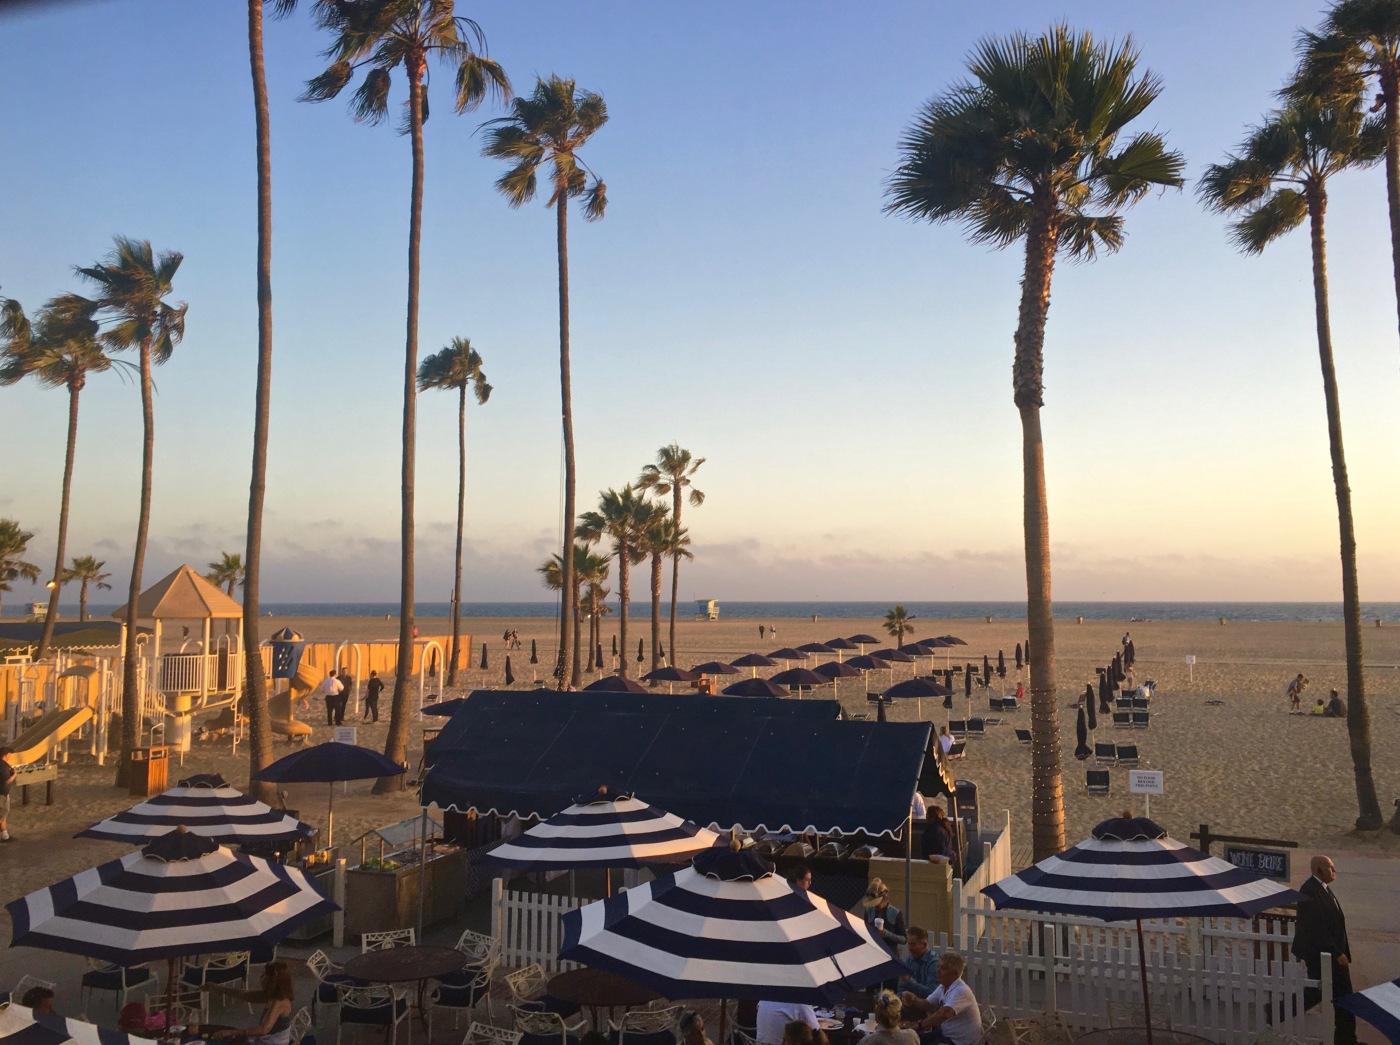 Day 195/5 Santa Monica